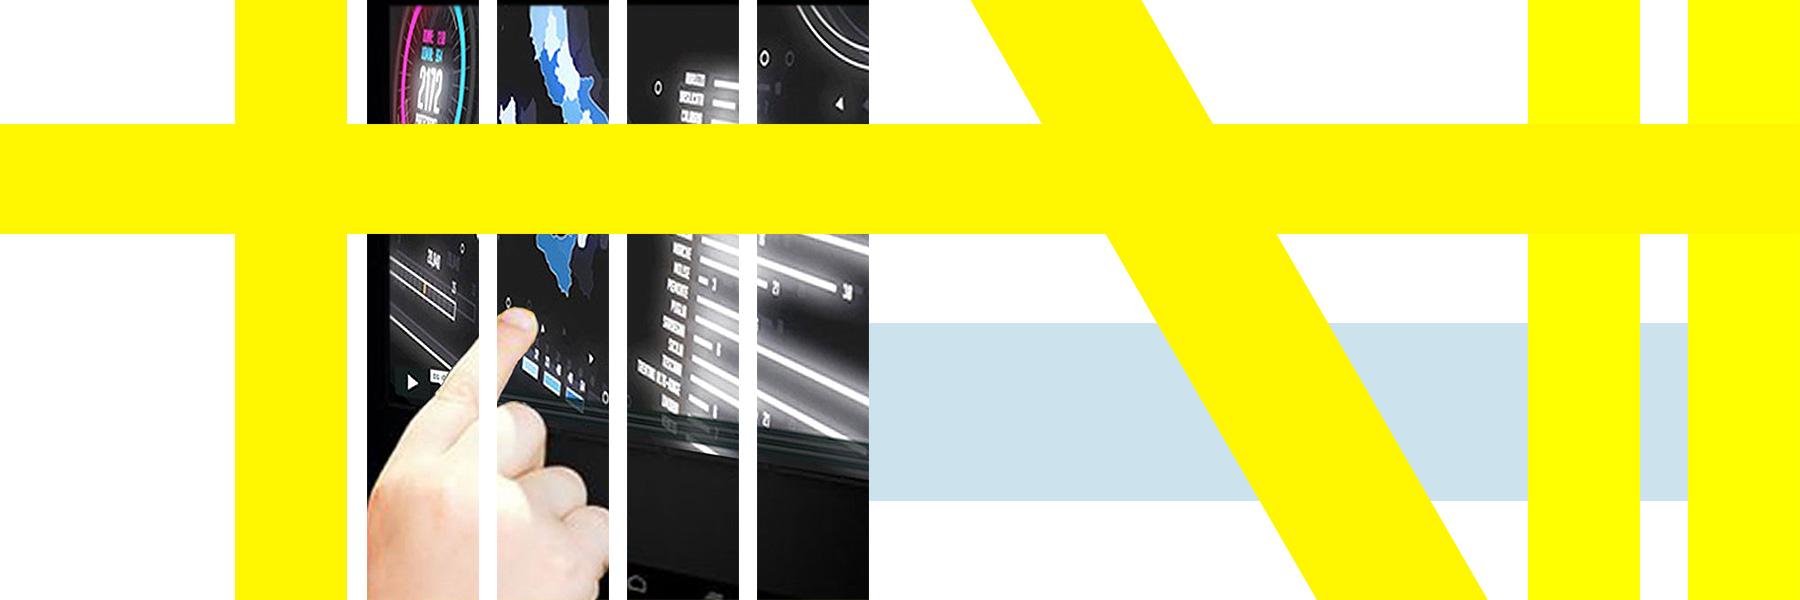 irotee-global-design-office-design-for-innovation-design-strategies-intermezzo121